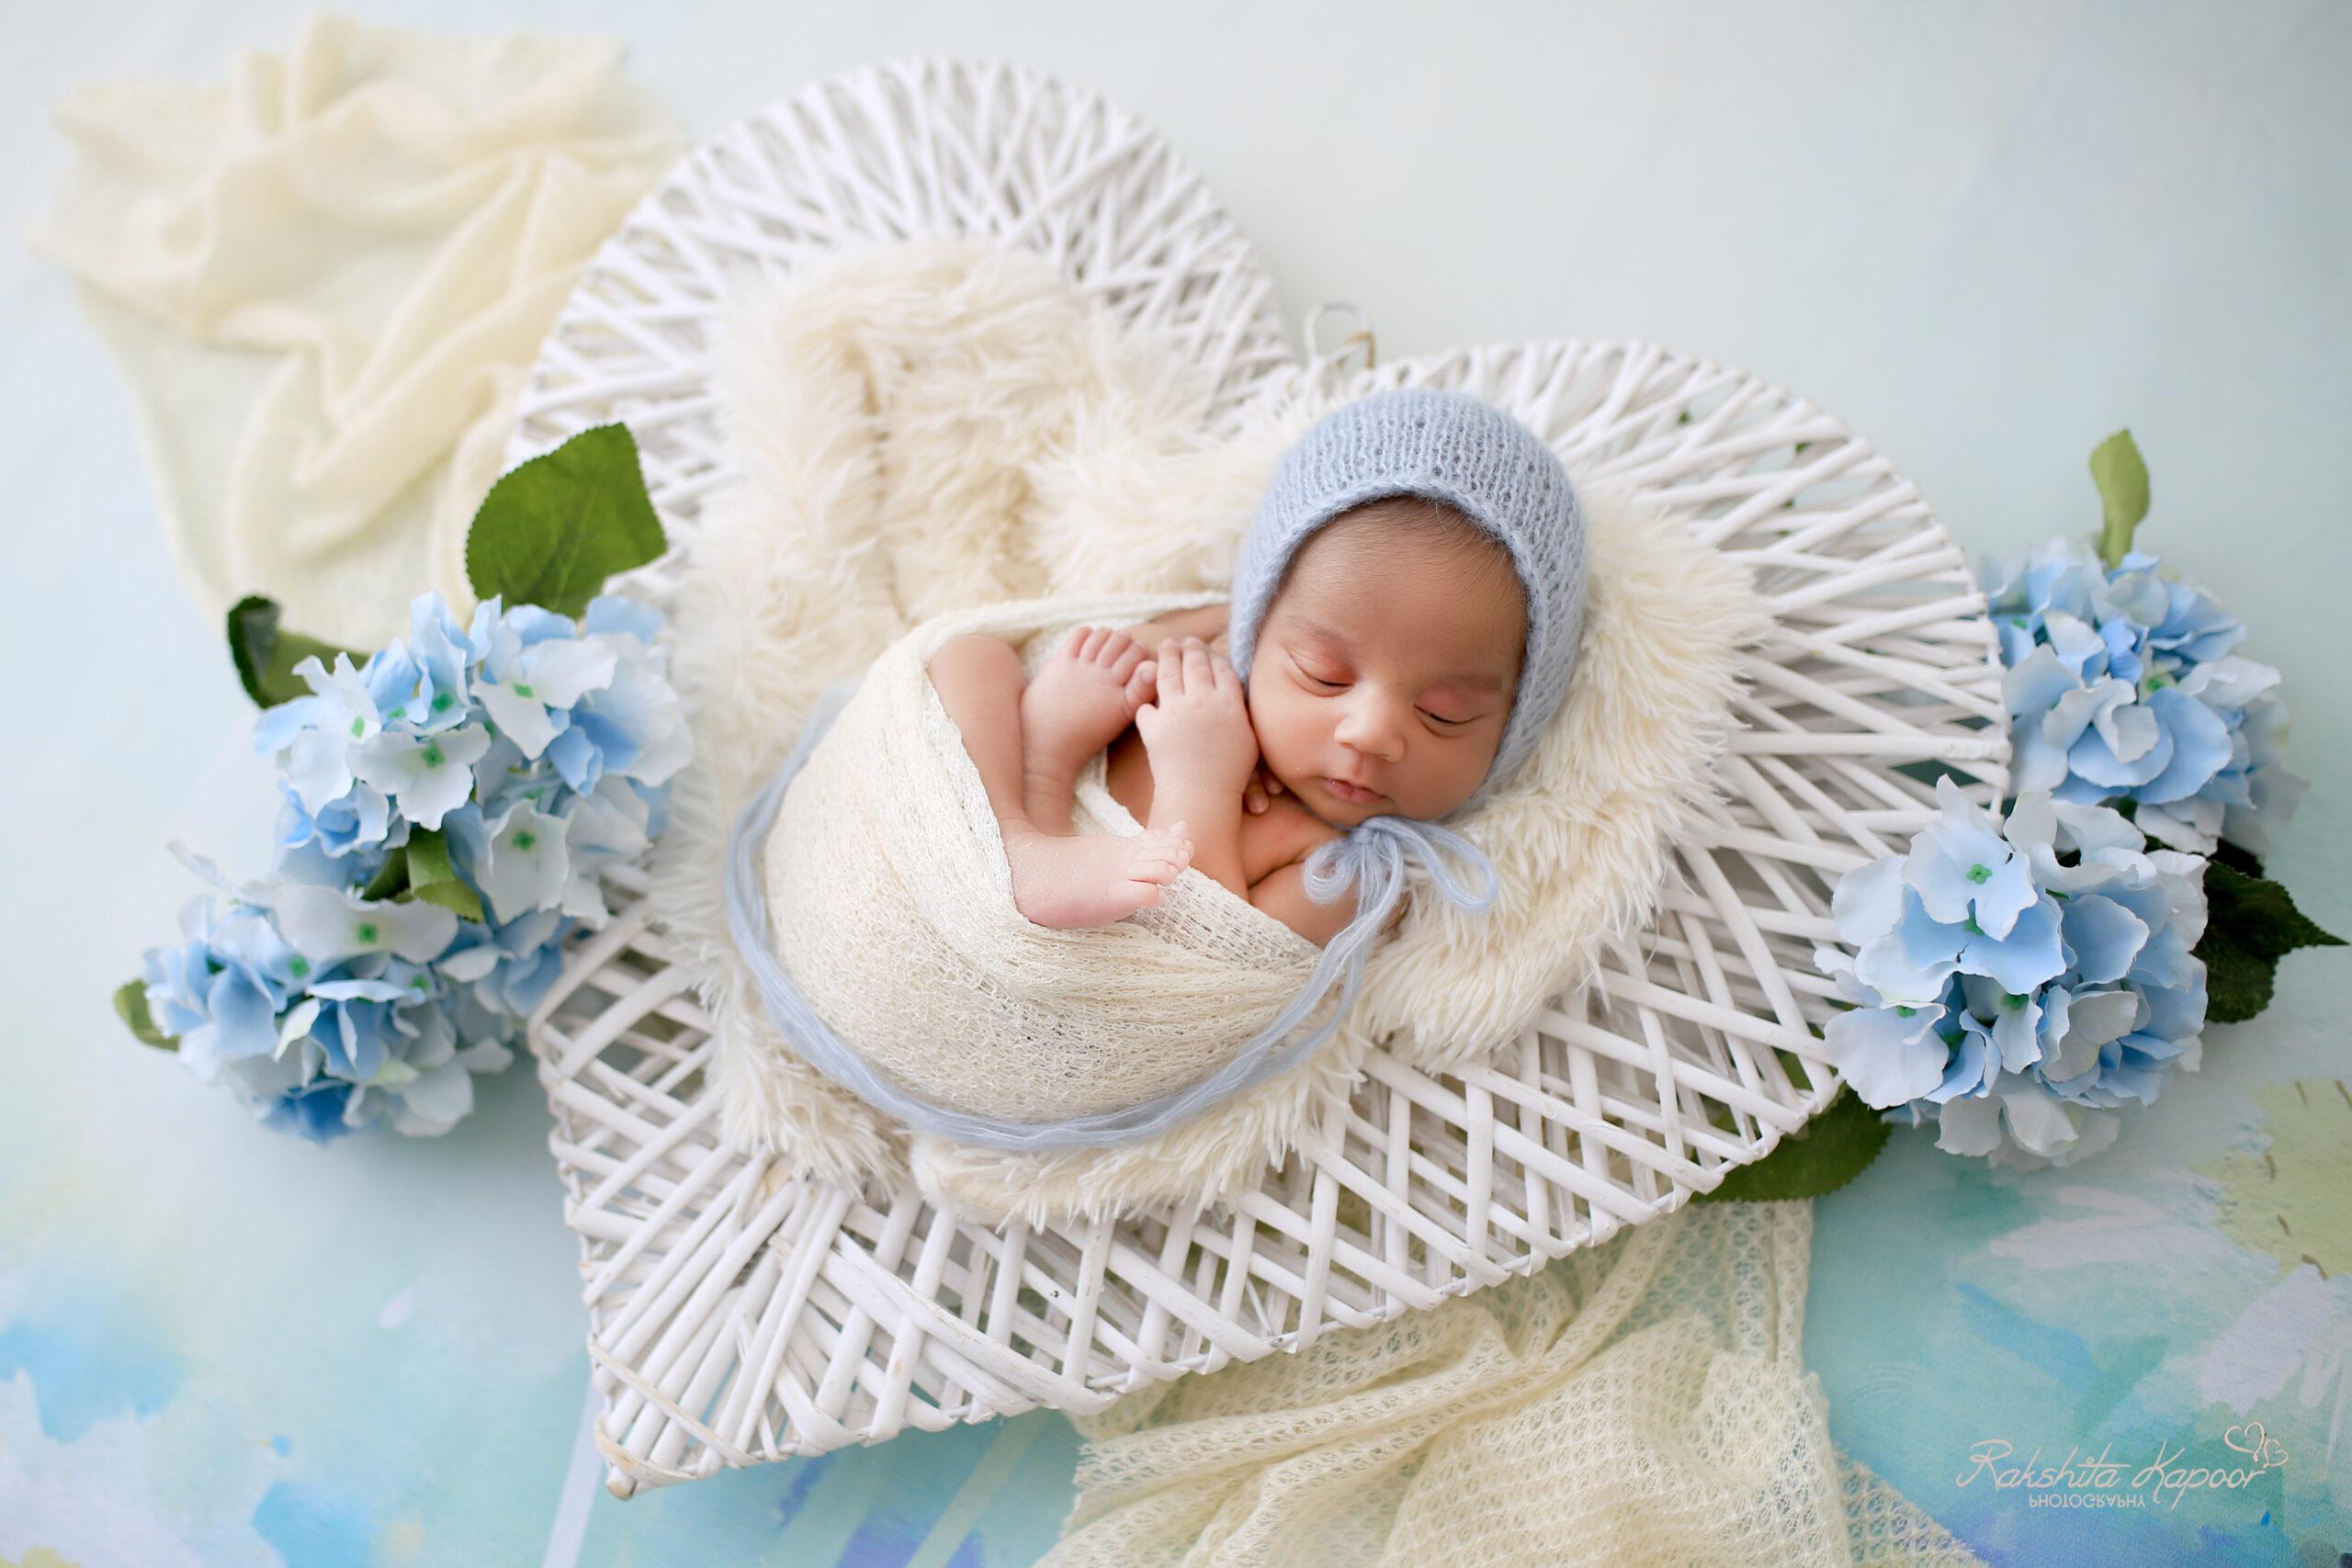 Best Newborn photography in Delhi NCR Noida Gurgaon   Rakshita Kapoor